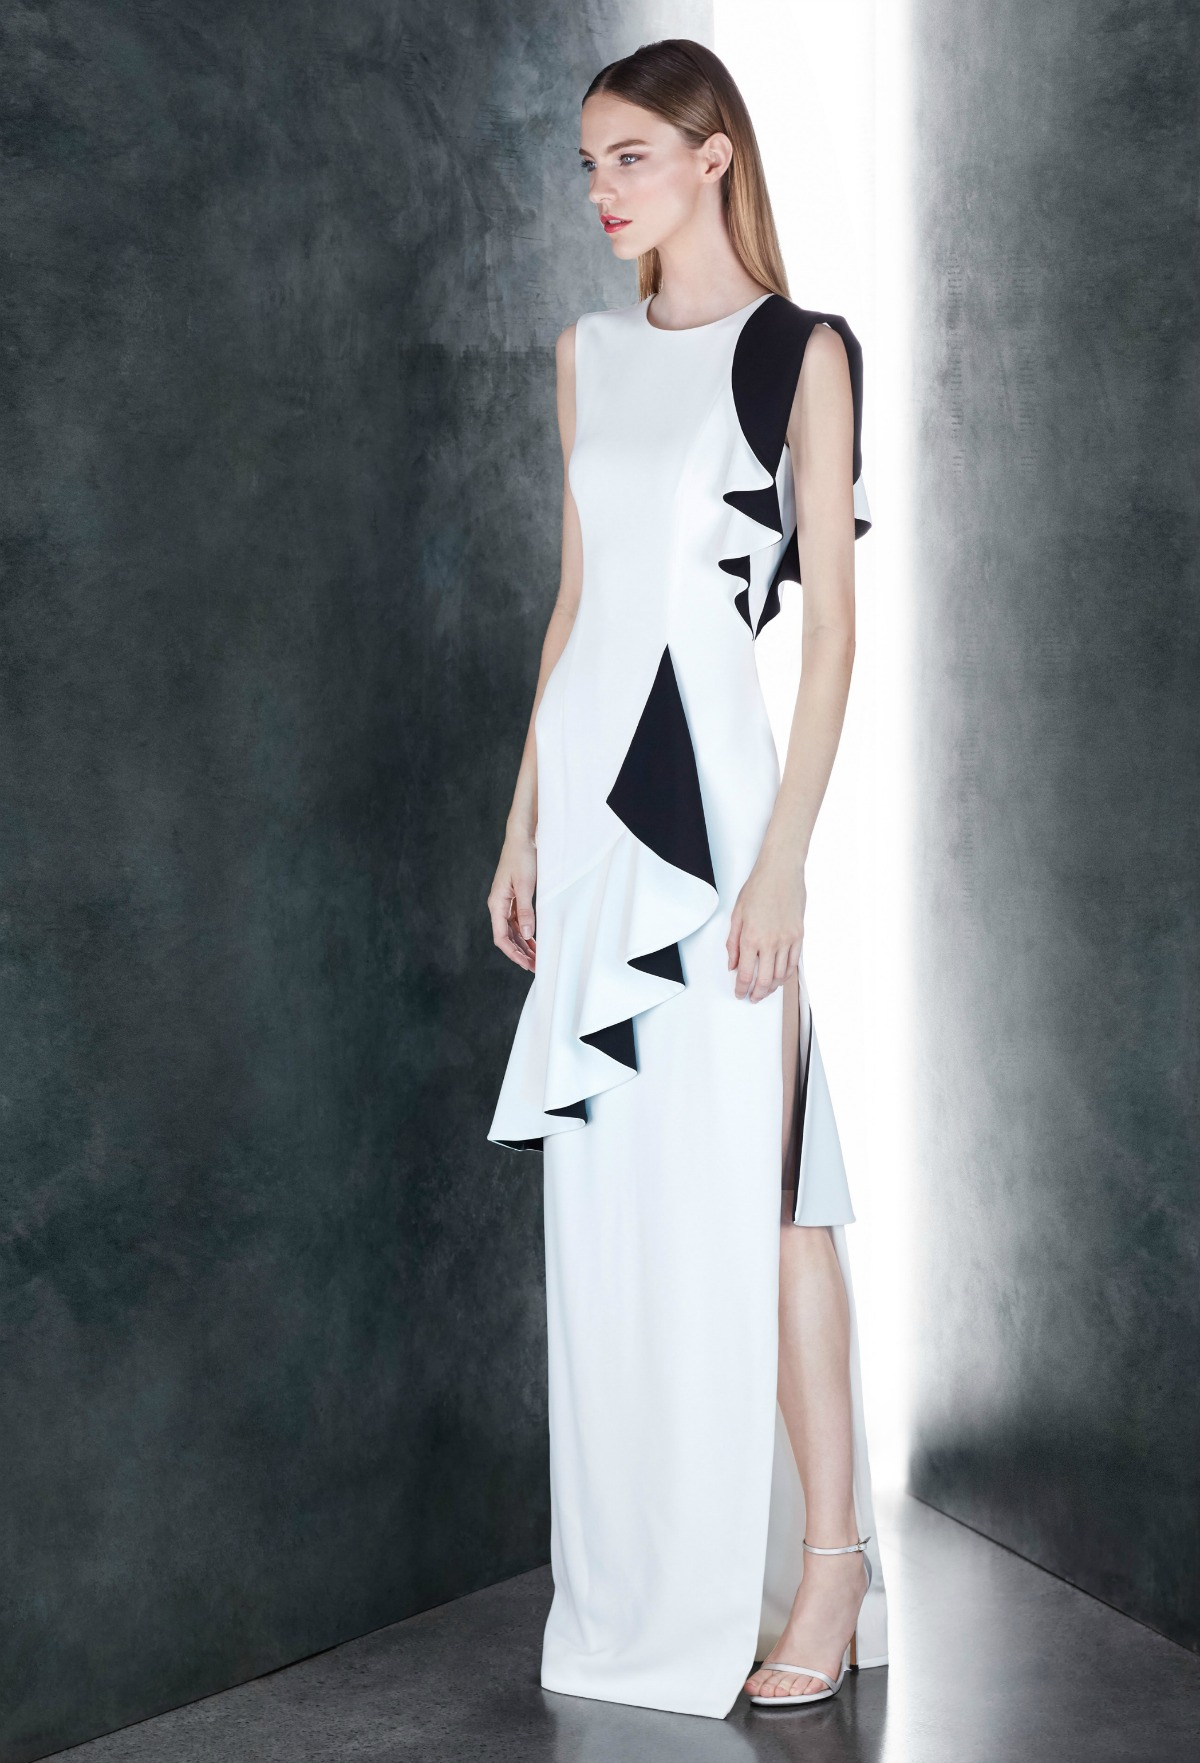 Tips fashion for skinny girls